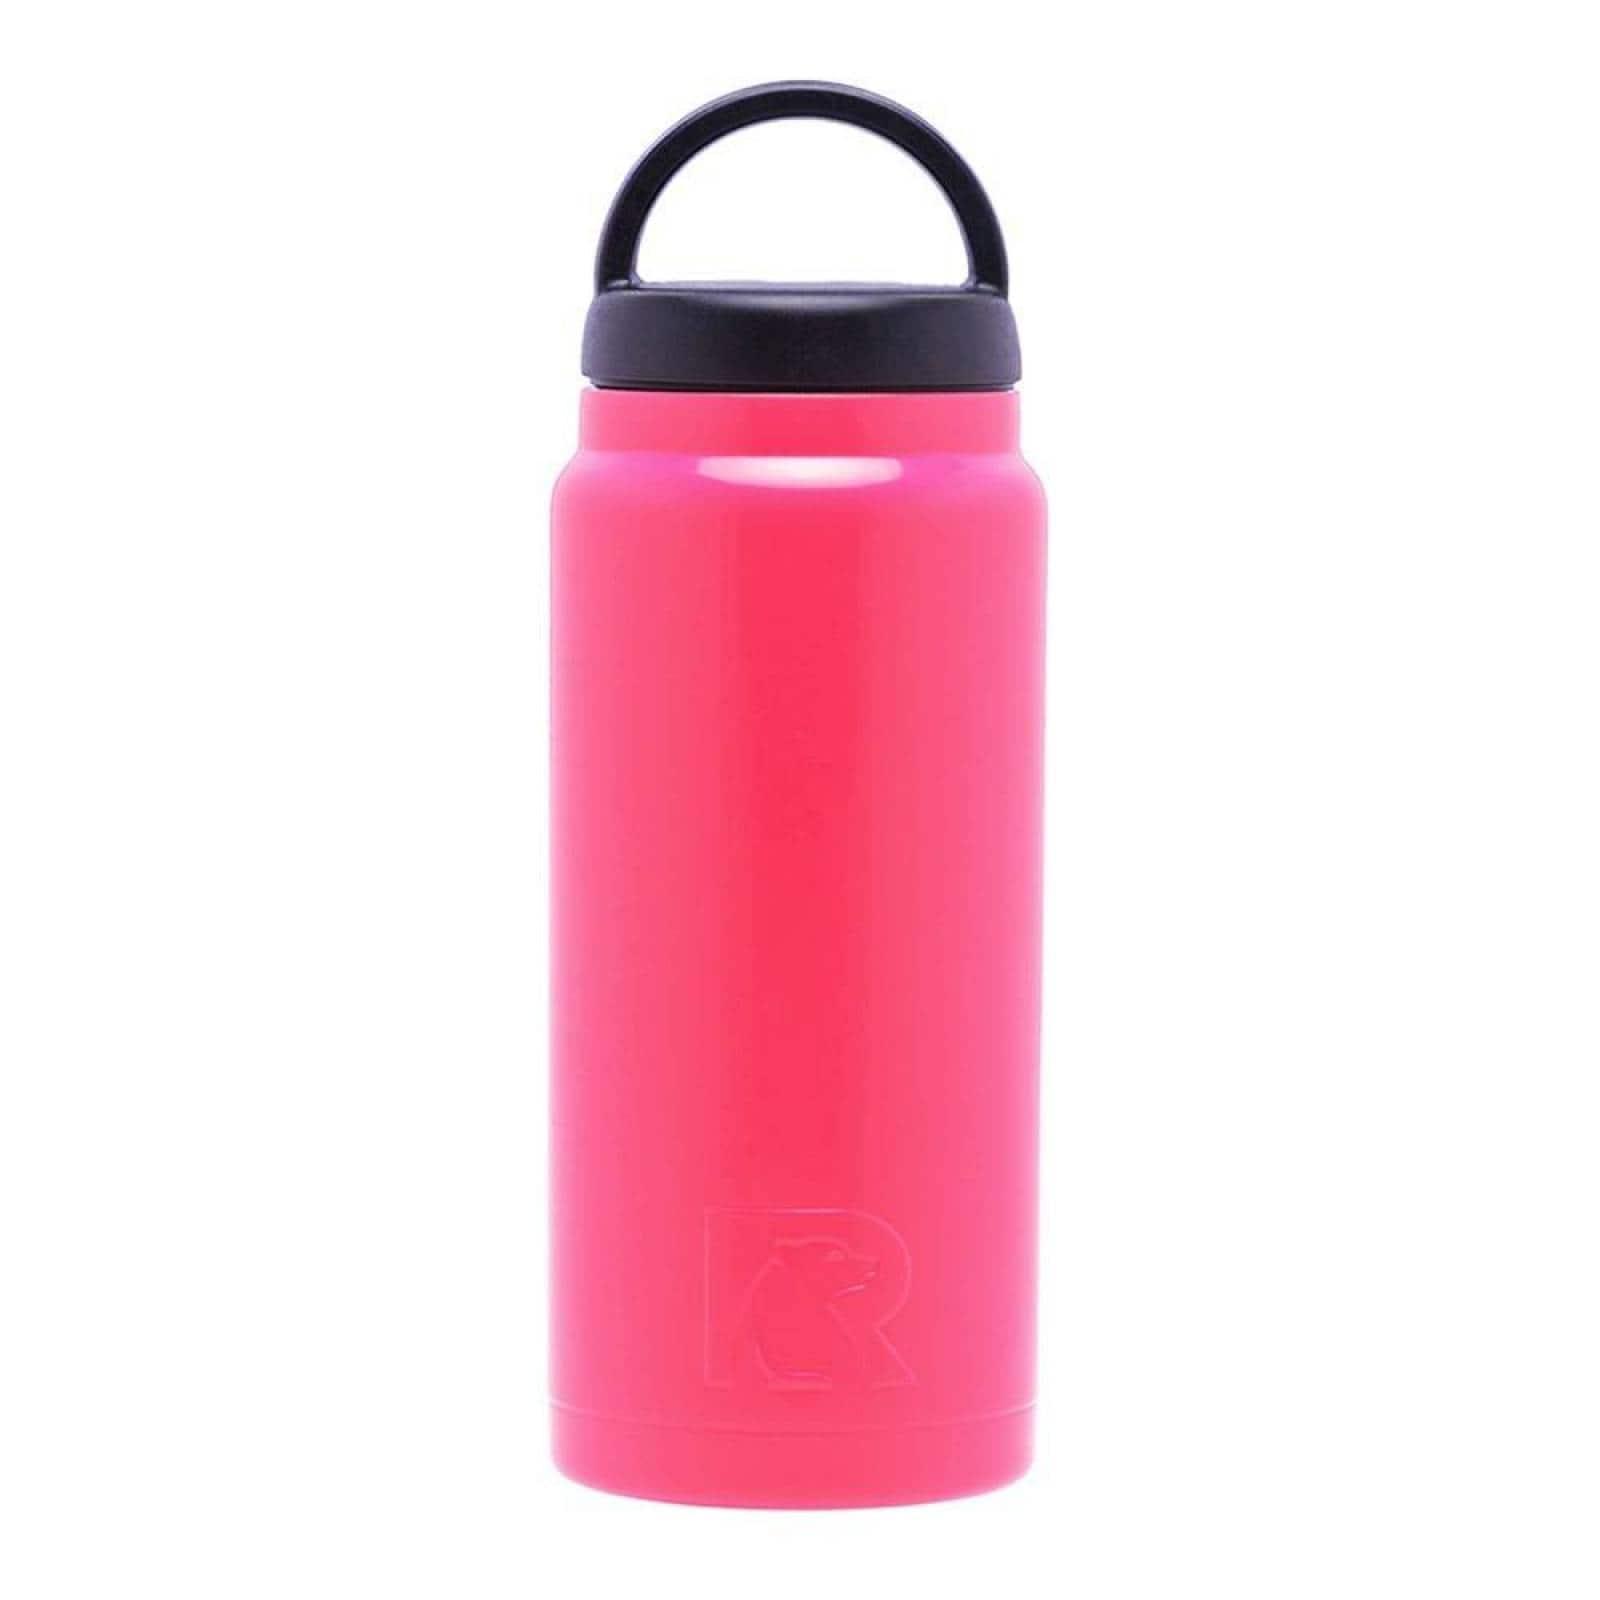 RTIC Bottle 18 oz. Pink   80